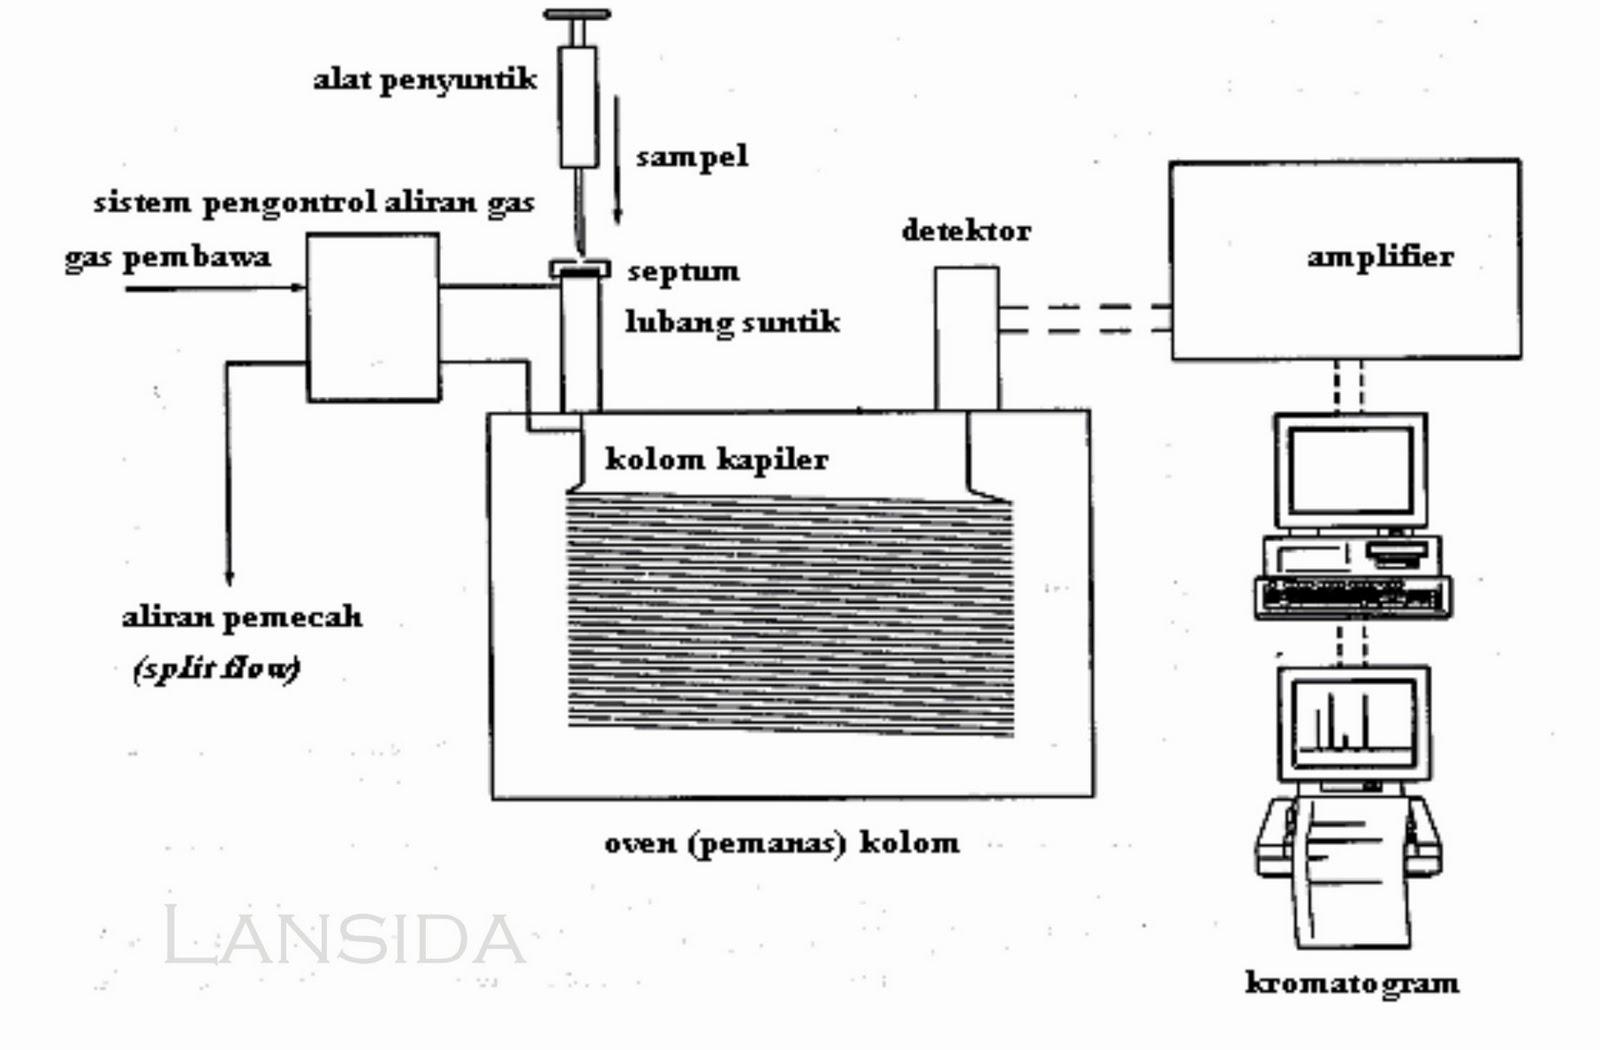 Alat Alat Laboratorium Dan Fungsinya Kromatografi